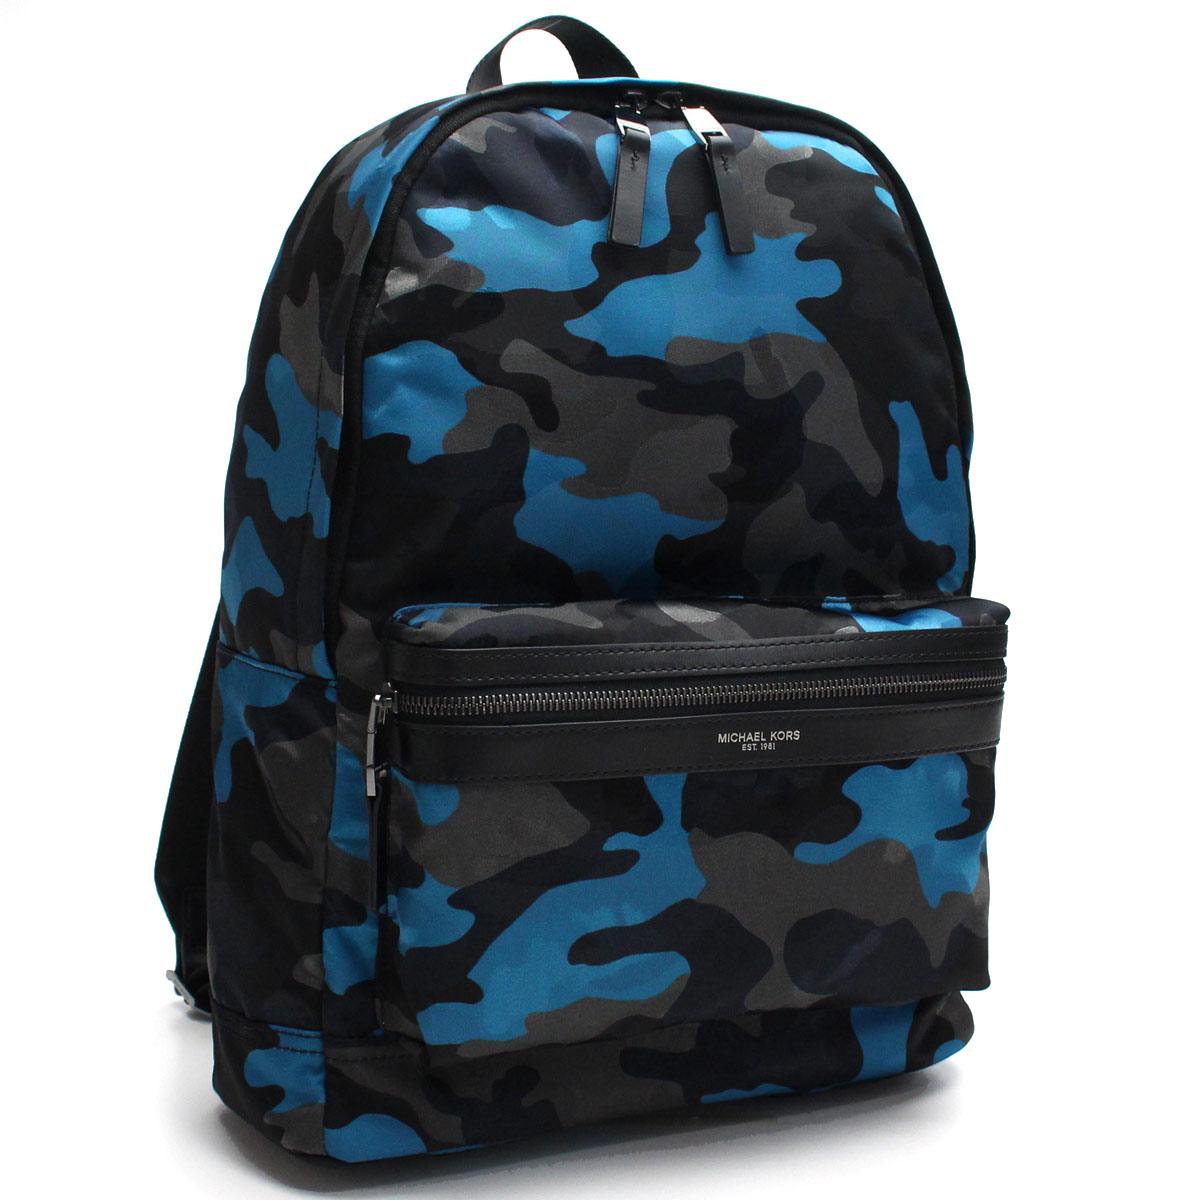 e5be826c595c Bighit The total brand wholesale: Michael Kors MICHAEL KORS rucksack KENT  Kent blue camouflage backpack 33F7LKNB2R MIDNIGHT multicolored | Rakuten  Global ...